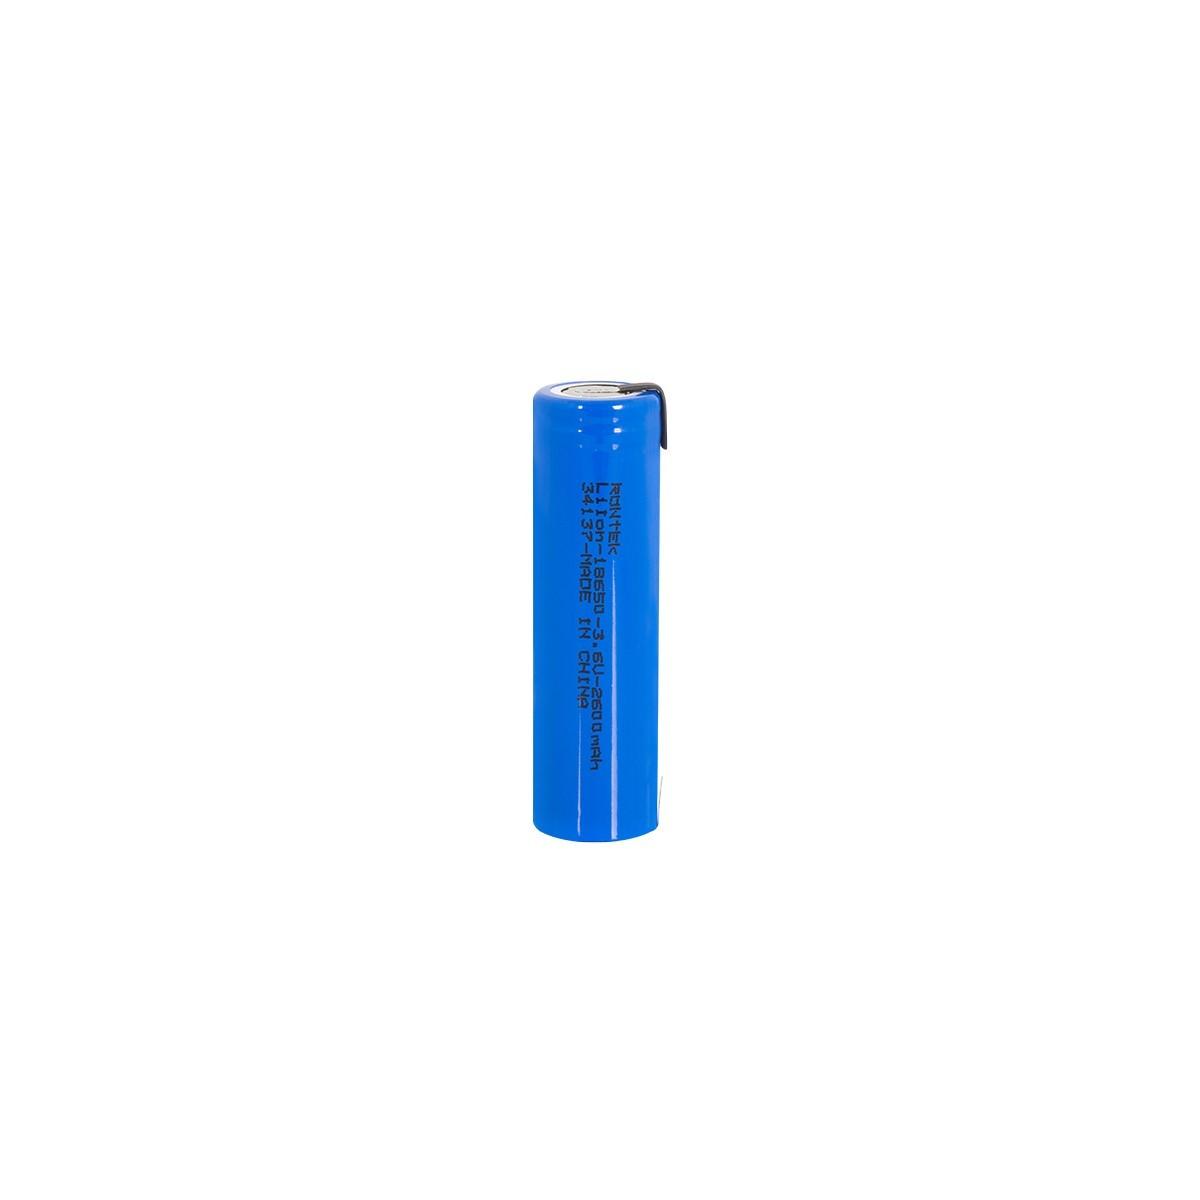 Bateria Recarregavel C/ Terminal LI-ION 18650 3.7V 2600MH Rontek